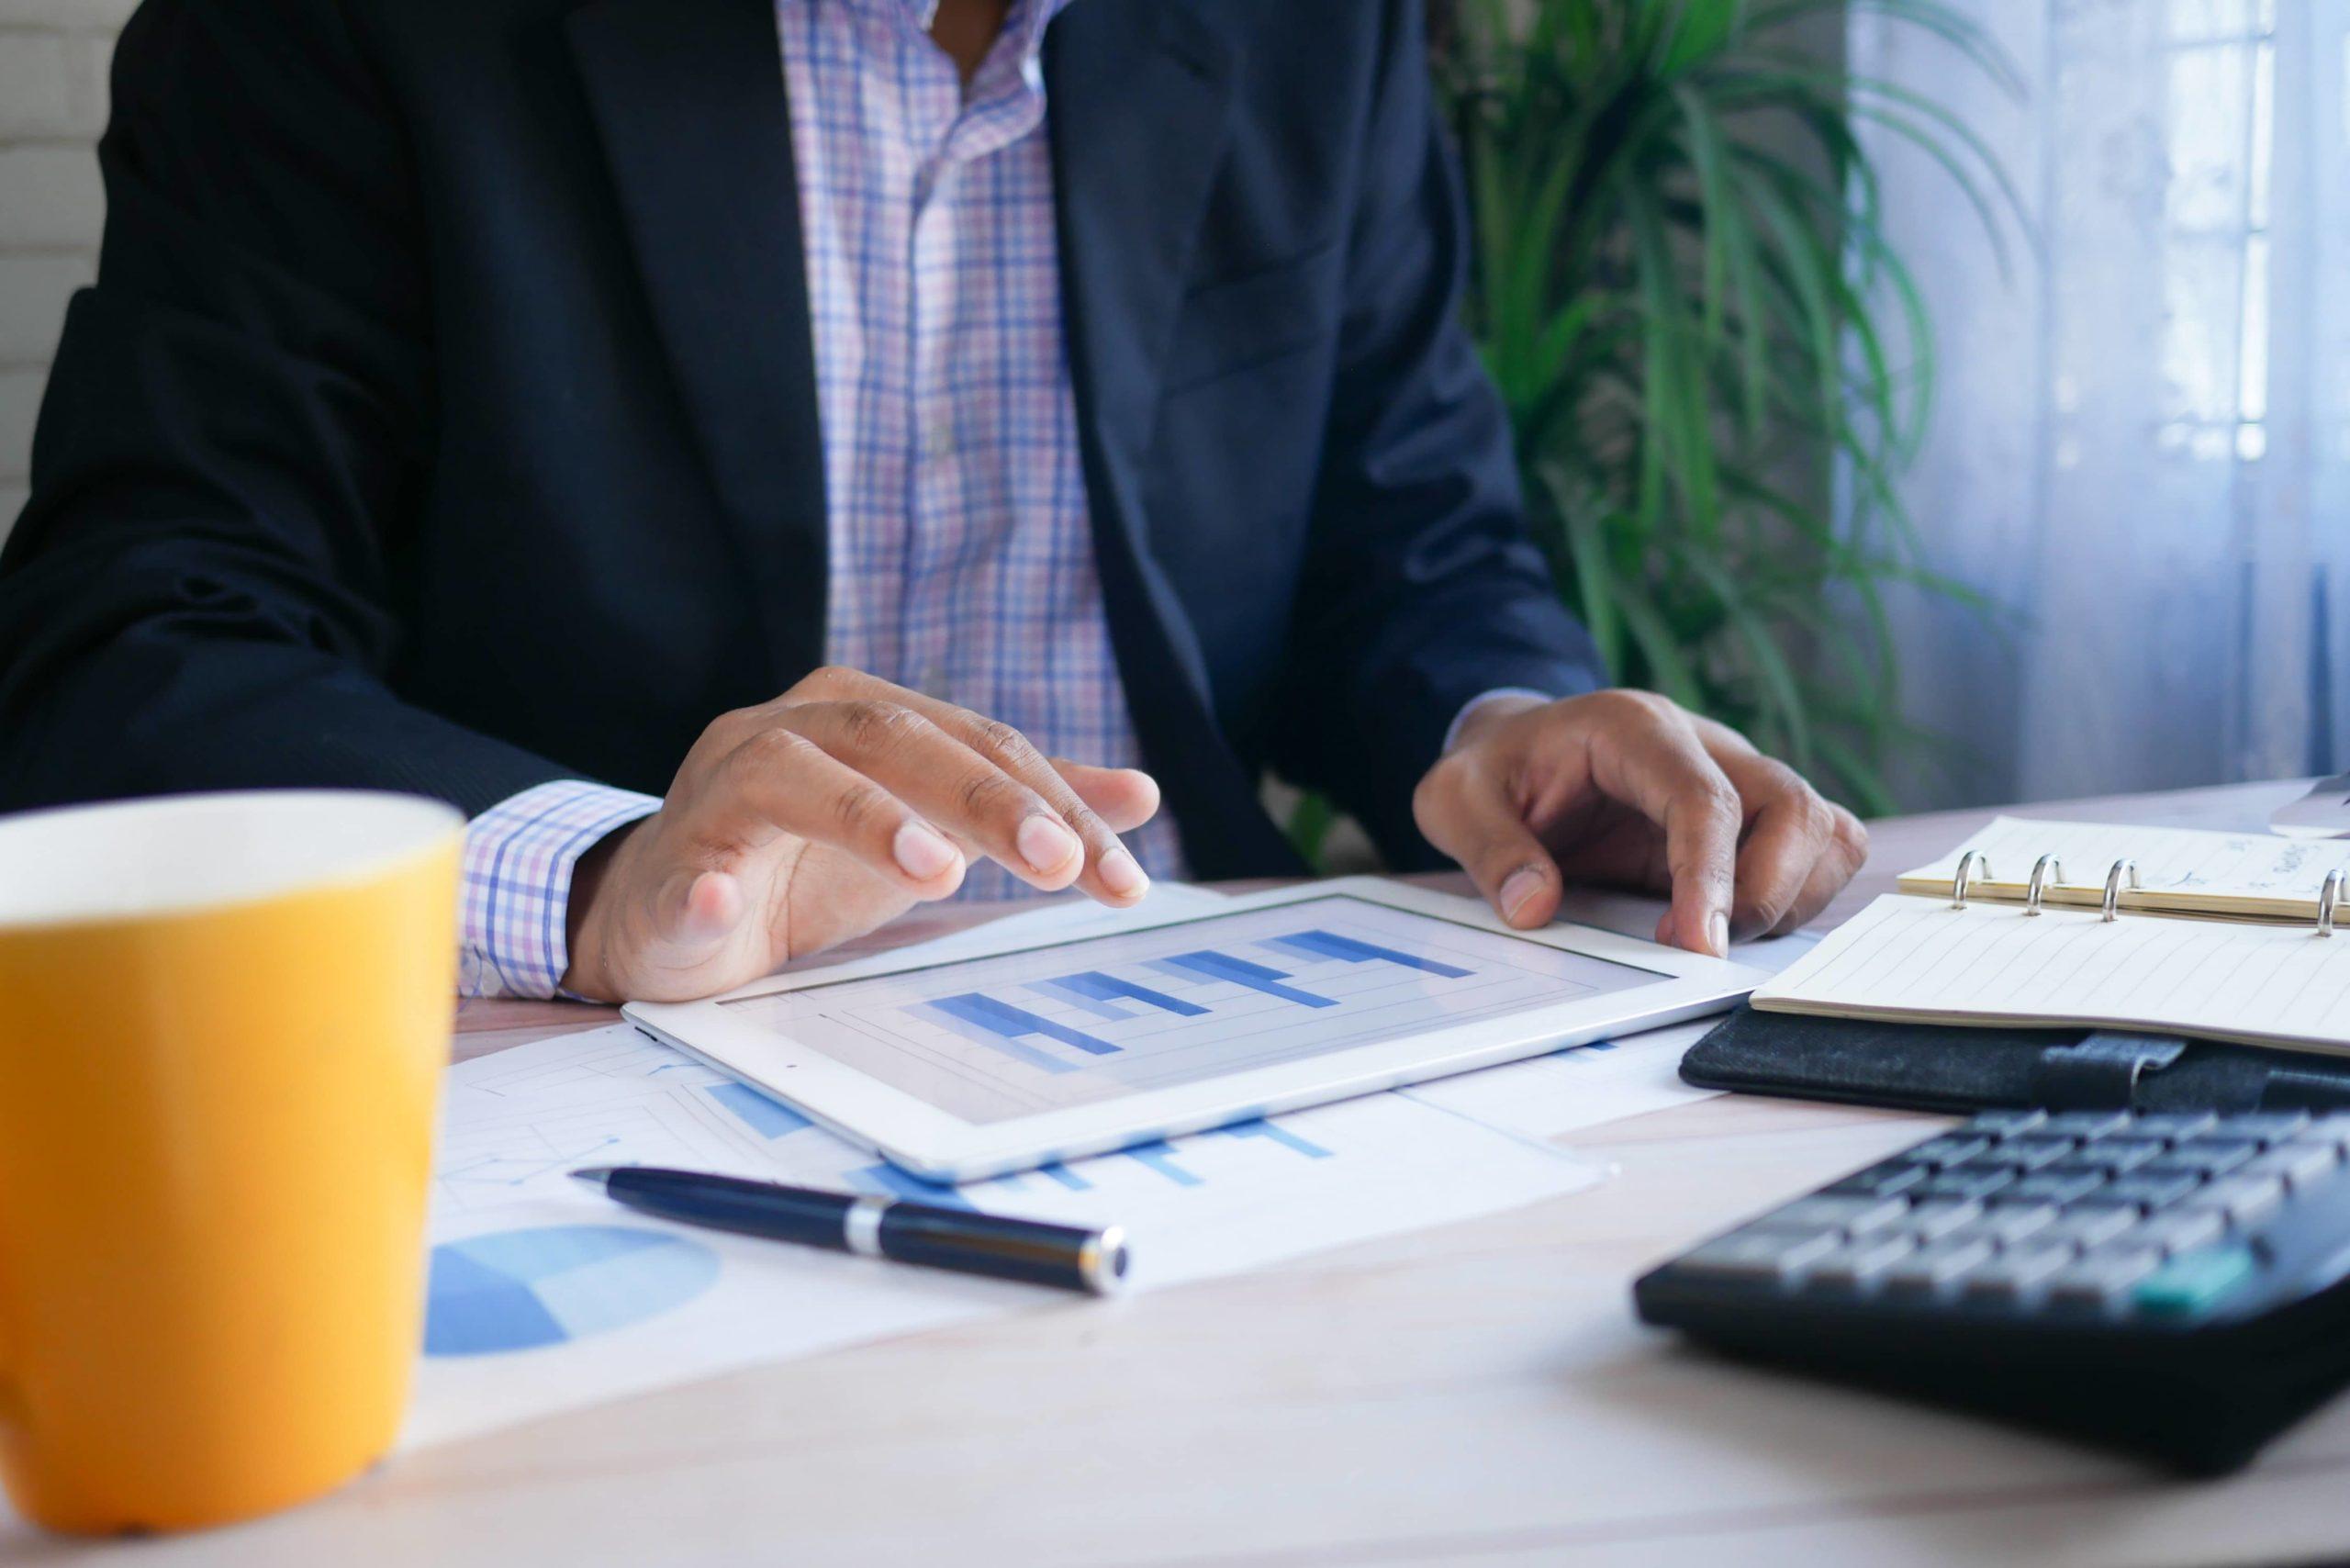 homme-analyse-finance-sur-tablette